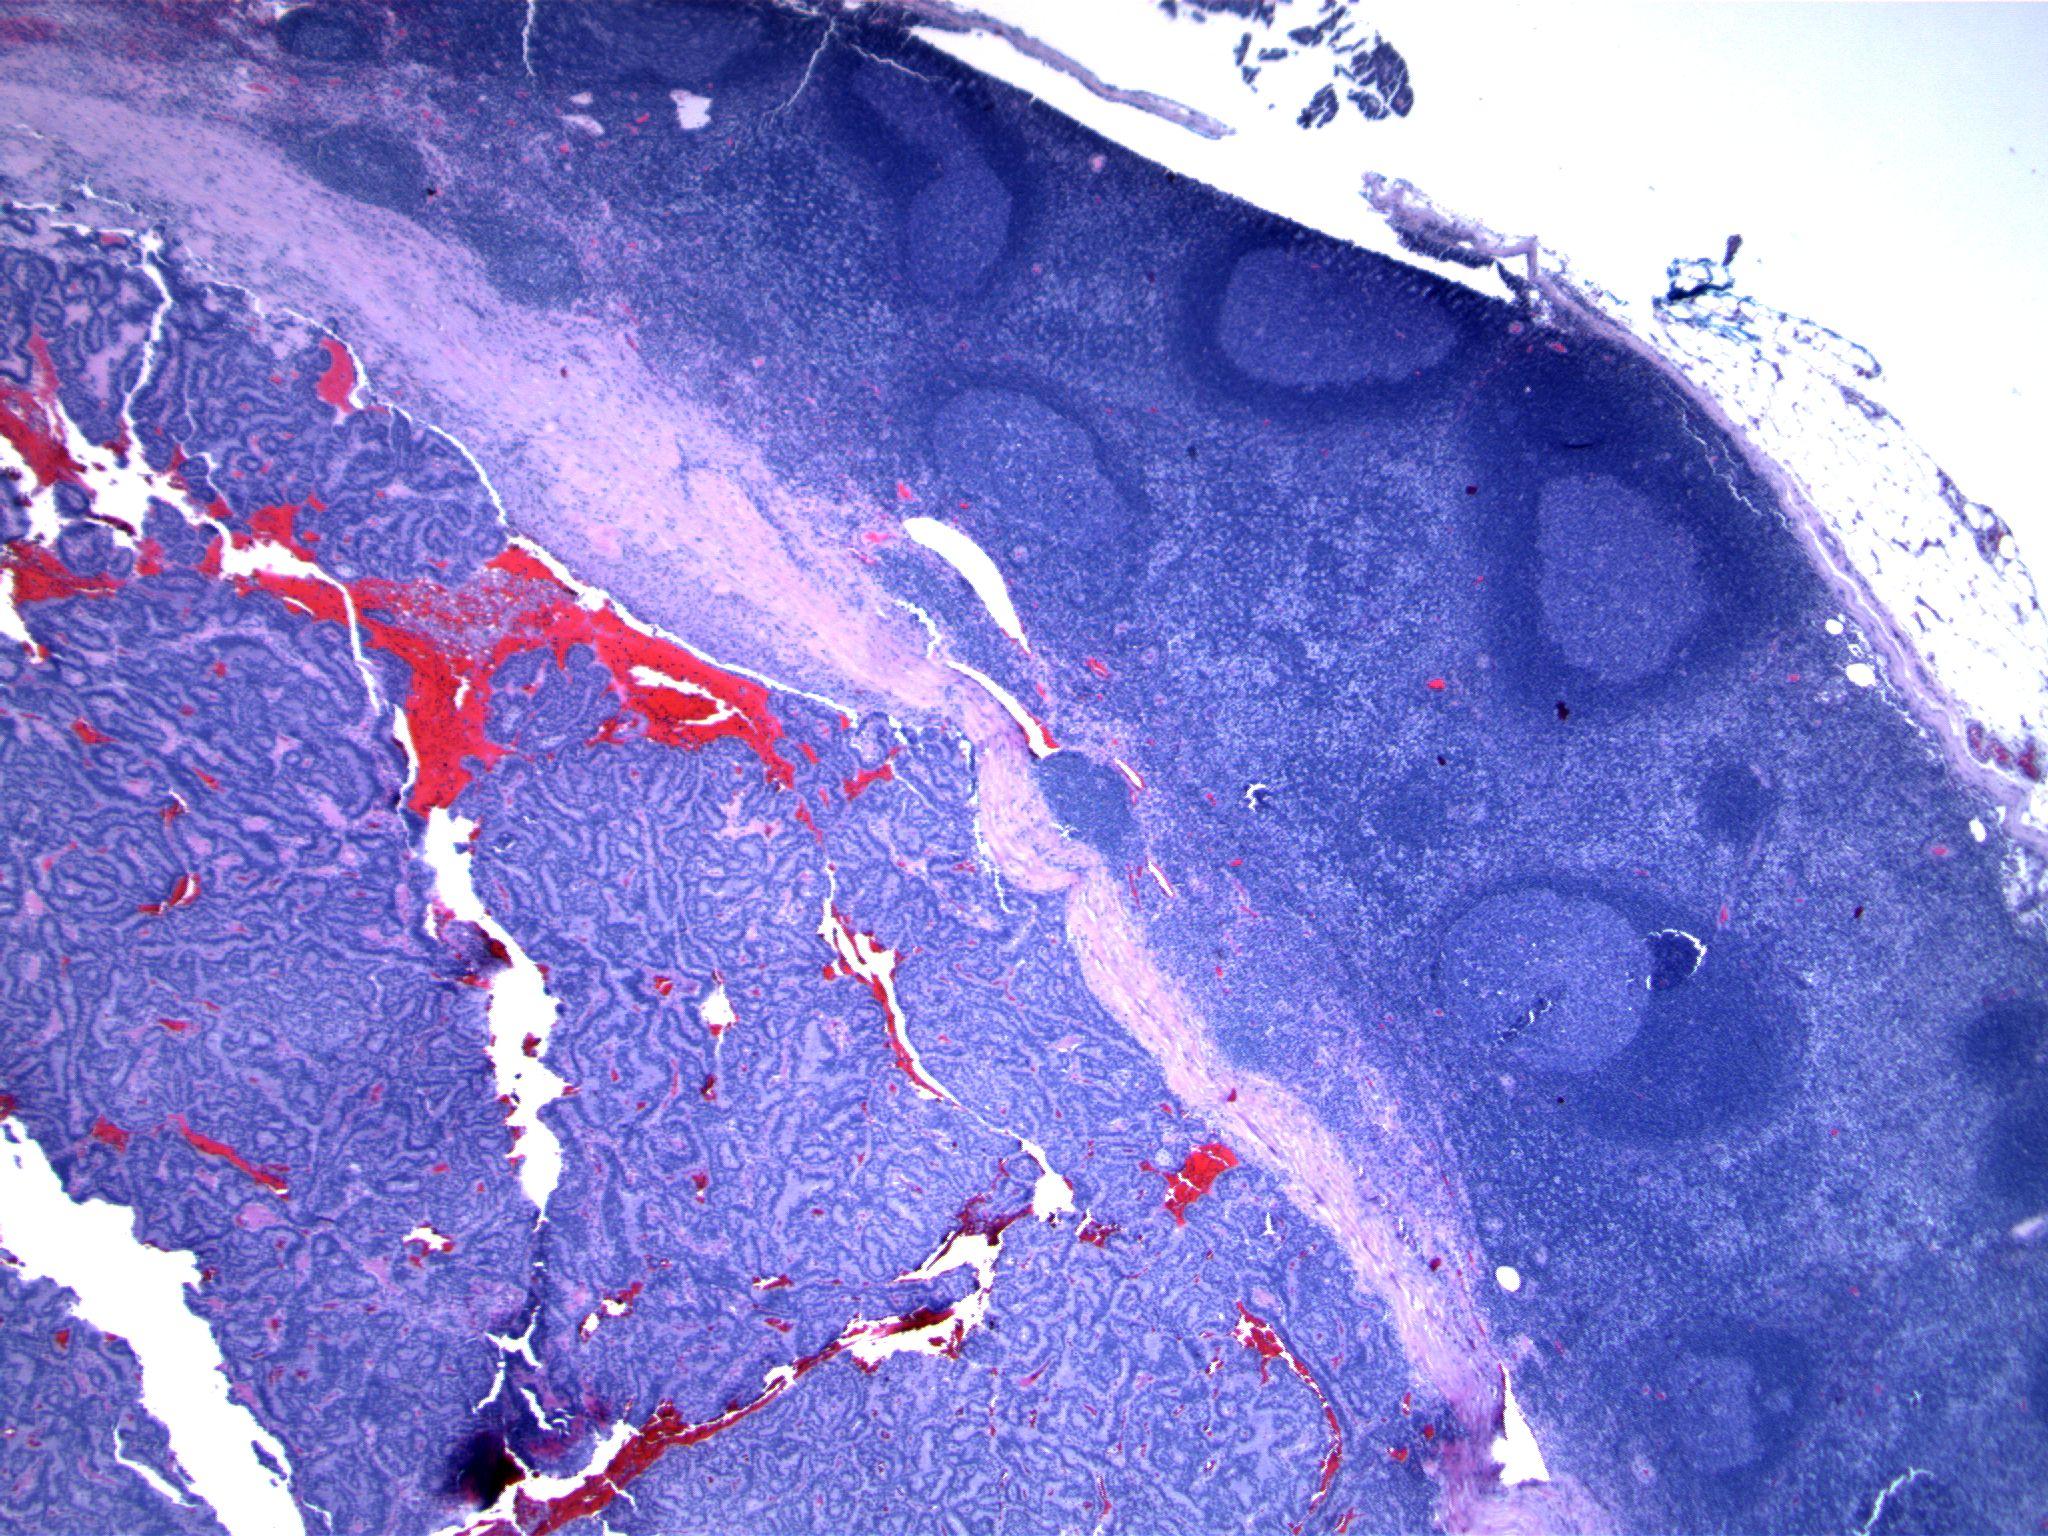 Image 1. A lymph node contains an epithelial proliferation.